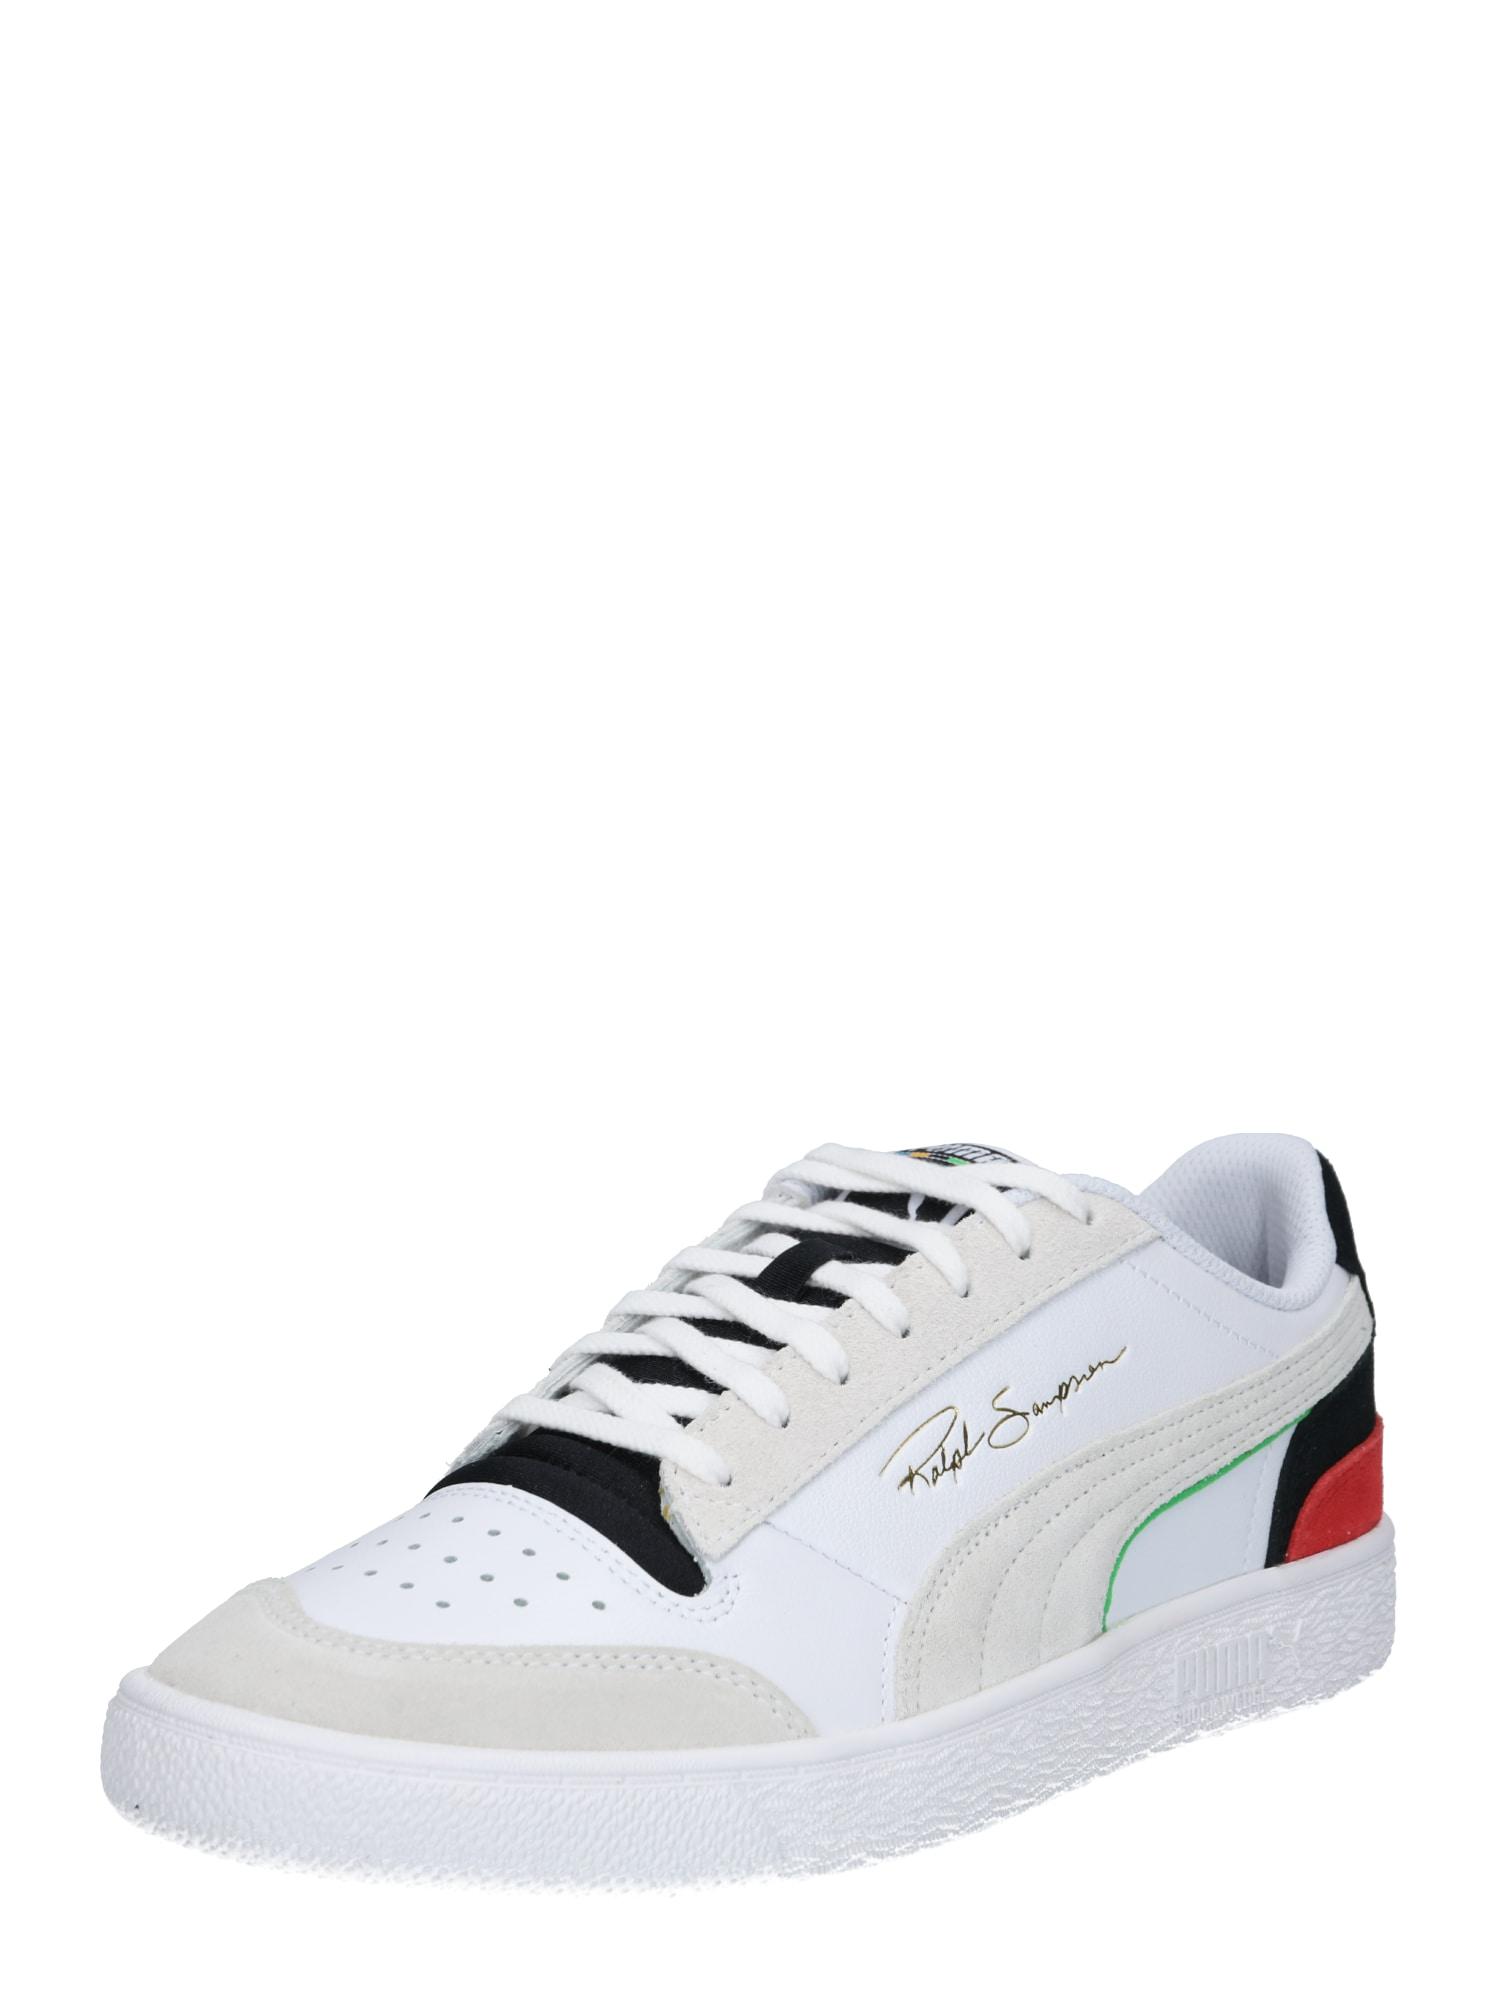 PUMA Sneaker bassa 'Ralph Sampson'  rosso / blu / bianco / beige / nero male shop the look